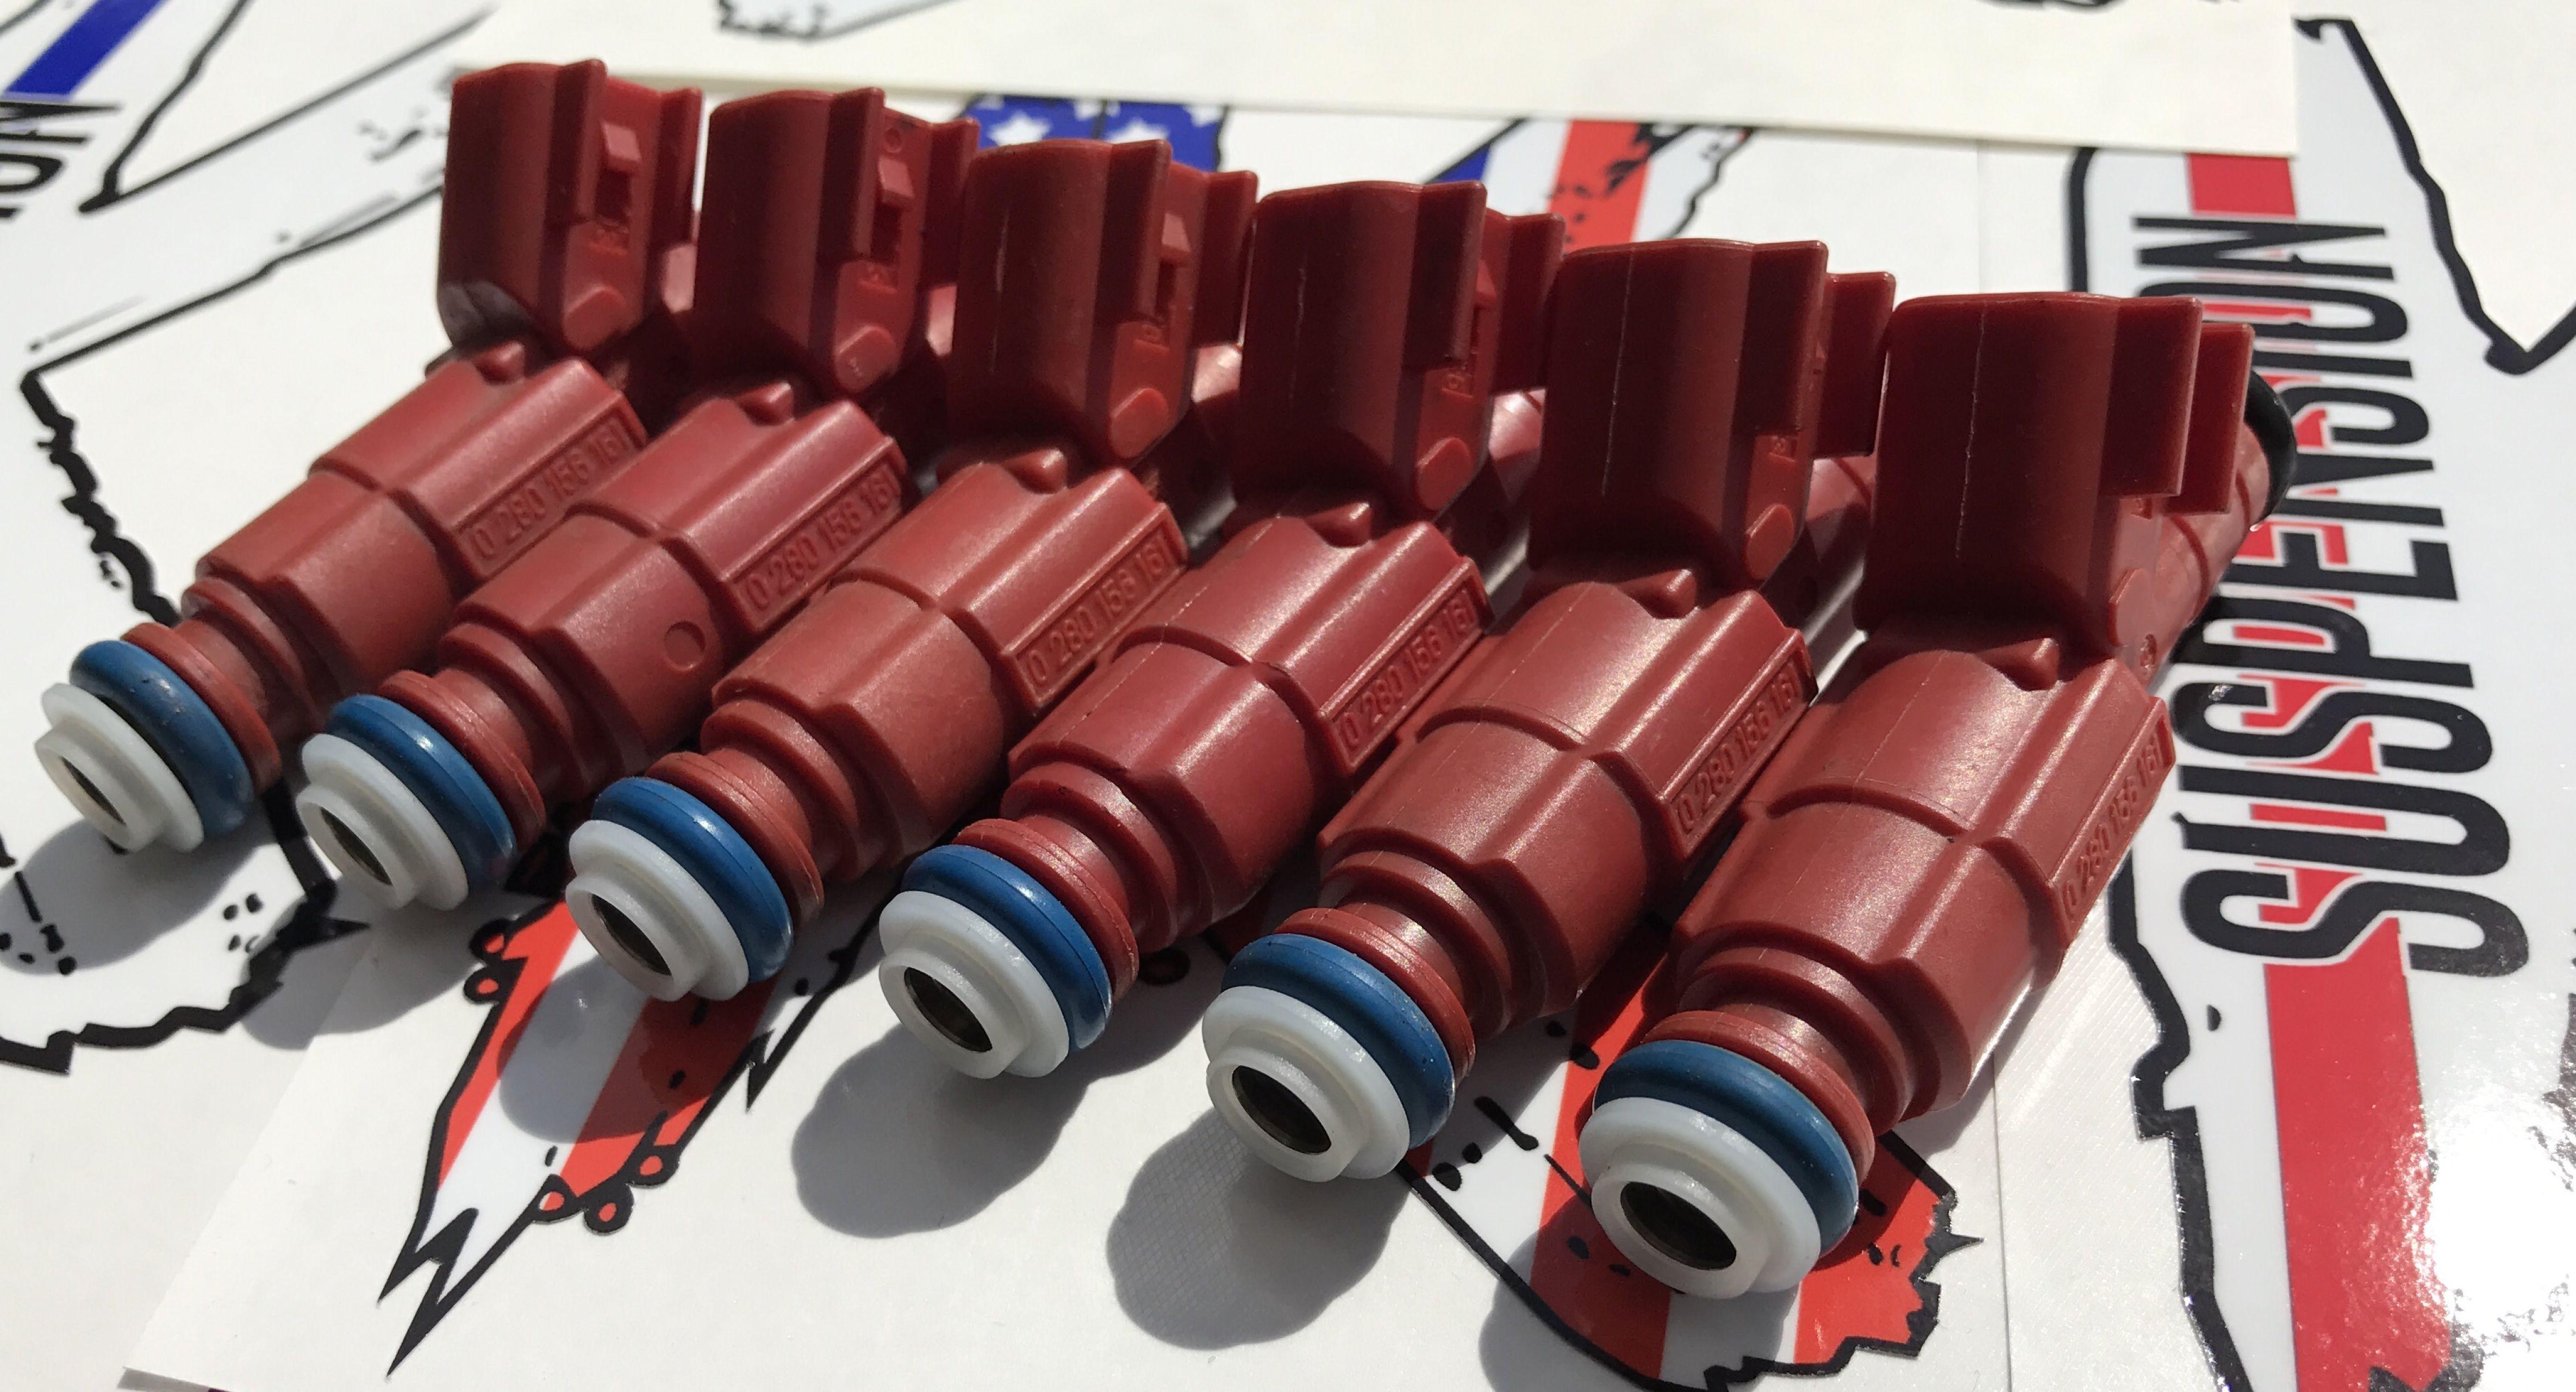 Remanufactured 12 Port Upgraded Injectors Jeep Zj Jeep Wj Jeep Xj Mods